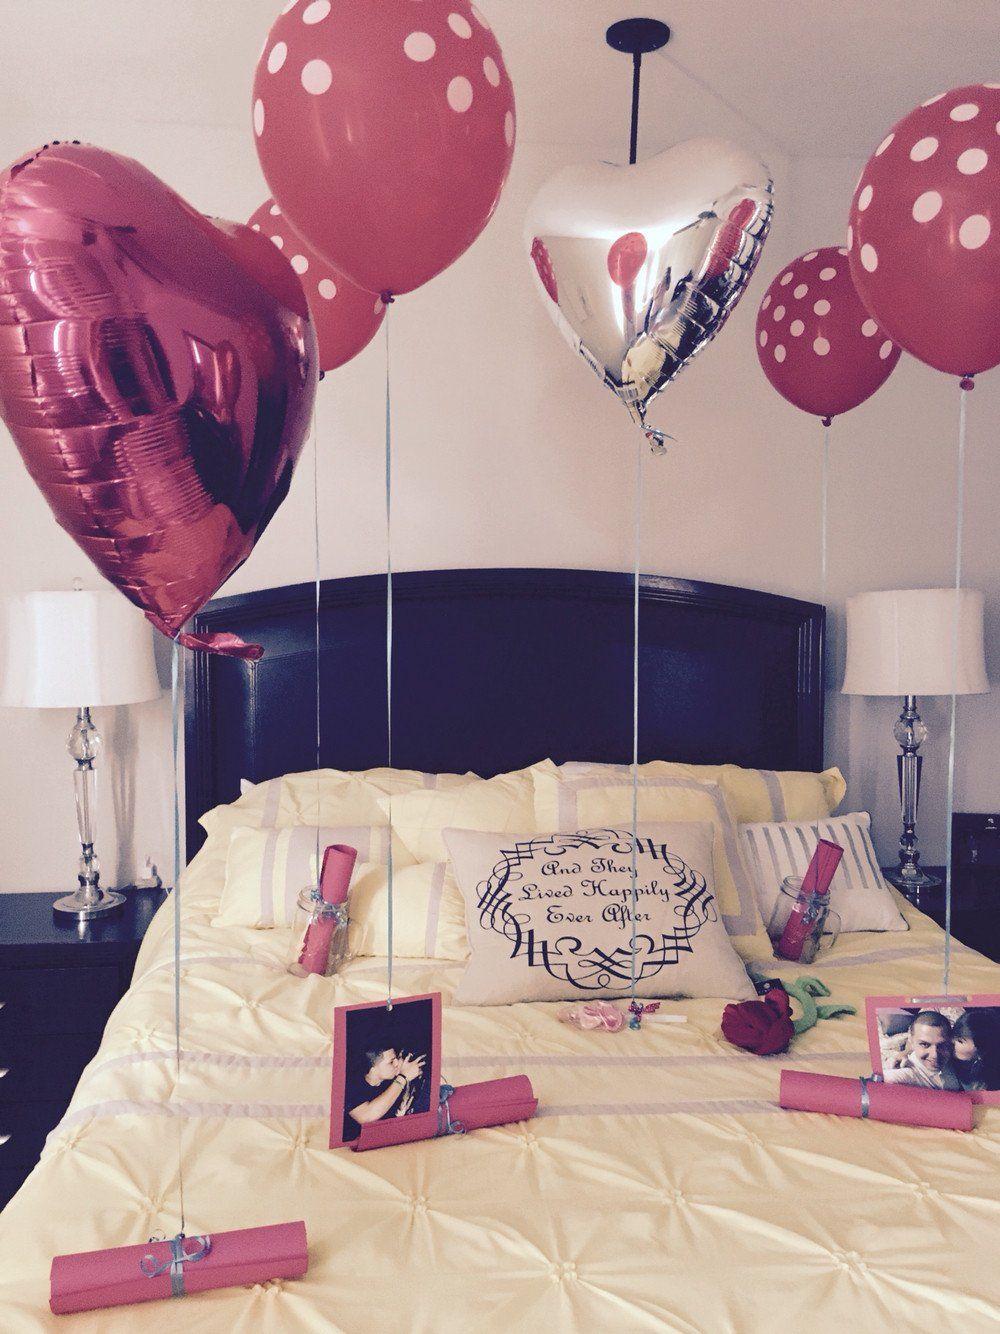 Romantic Bedrooms Ideas for Valentines Day Diy Valentine ...